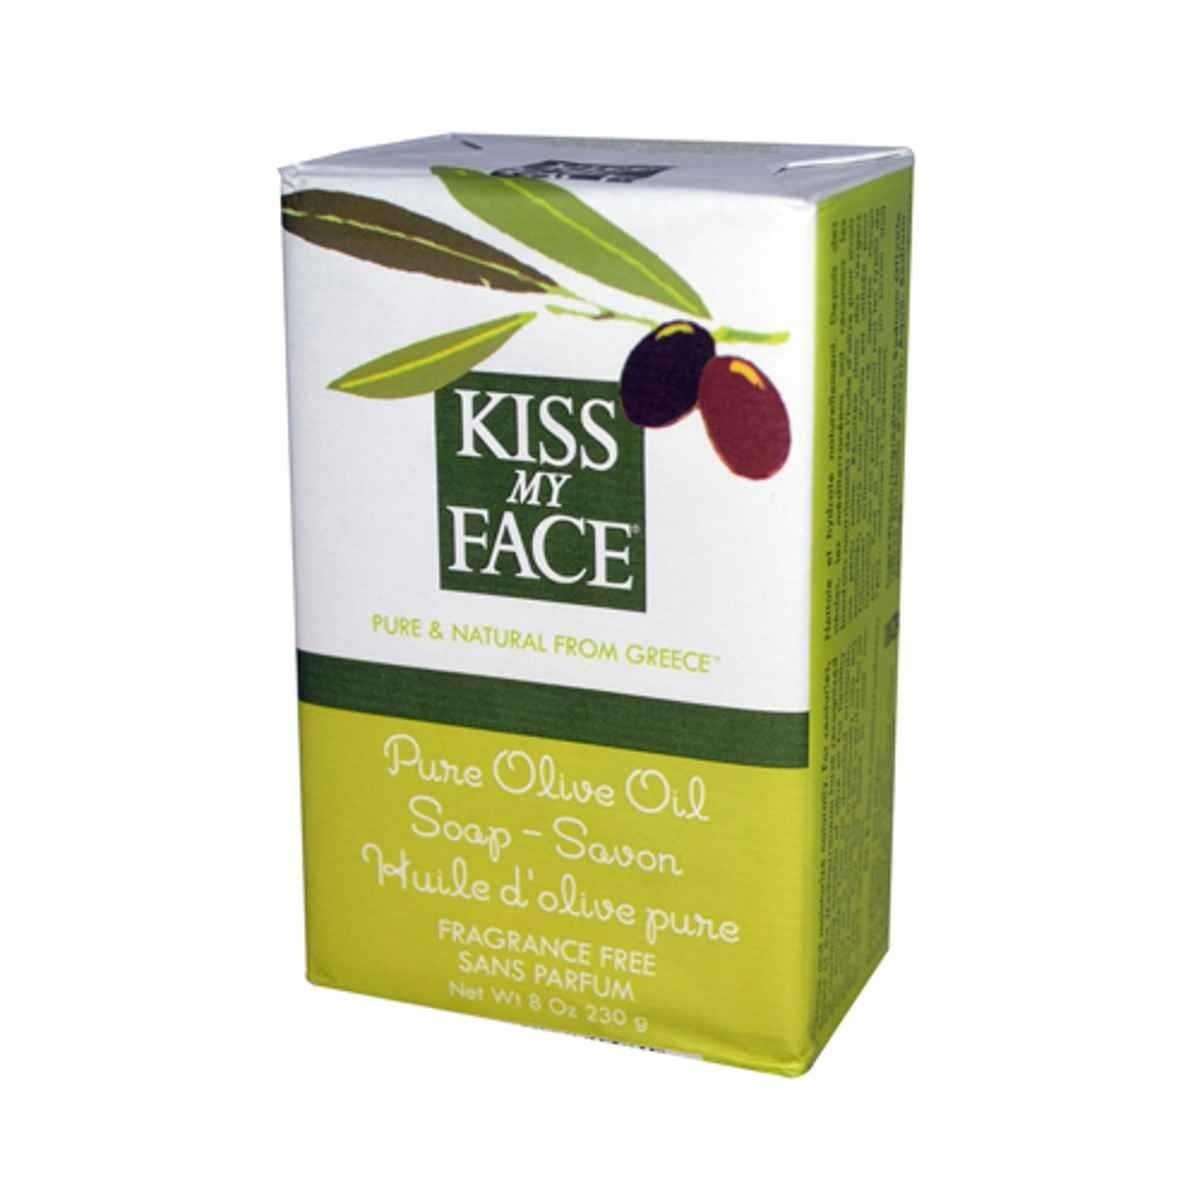 Kiss My Face Bar Soap, 8.0 oz, Pure Olive Oil. 1-Bar